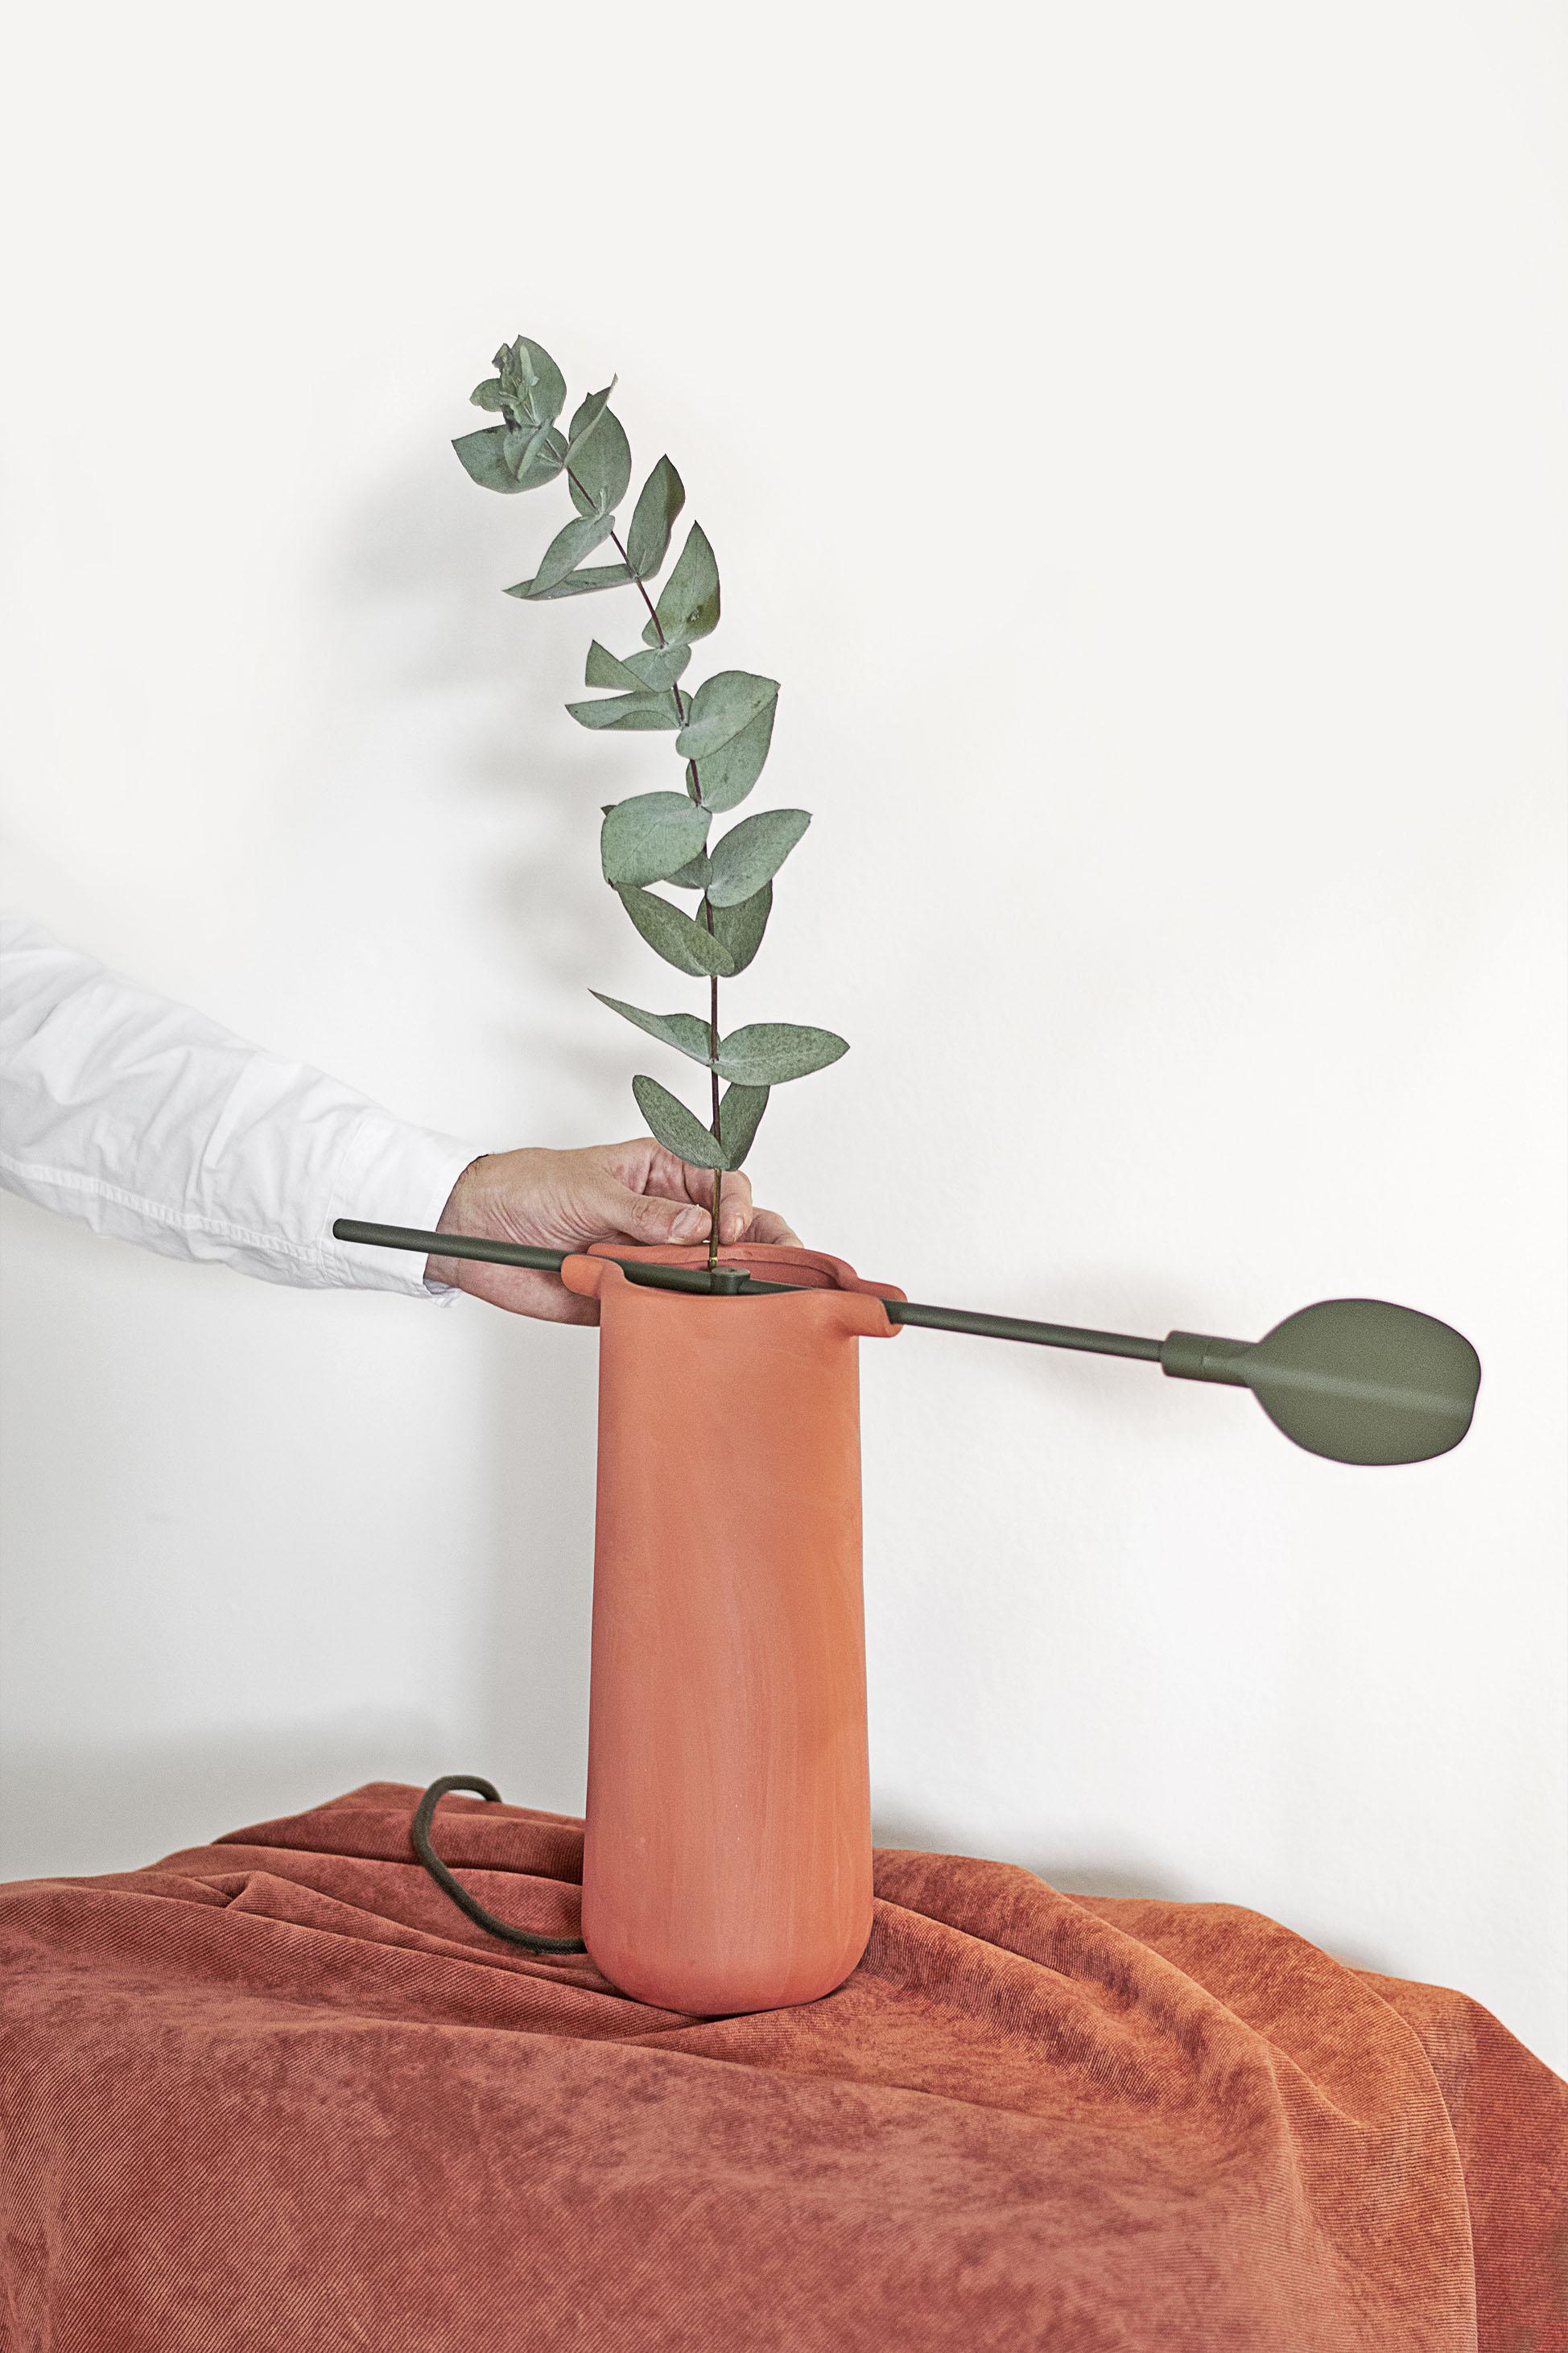 Minimalist Baobá Lamp by Ventura Lab